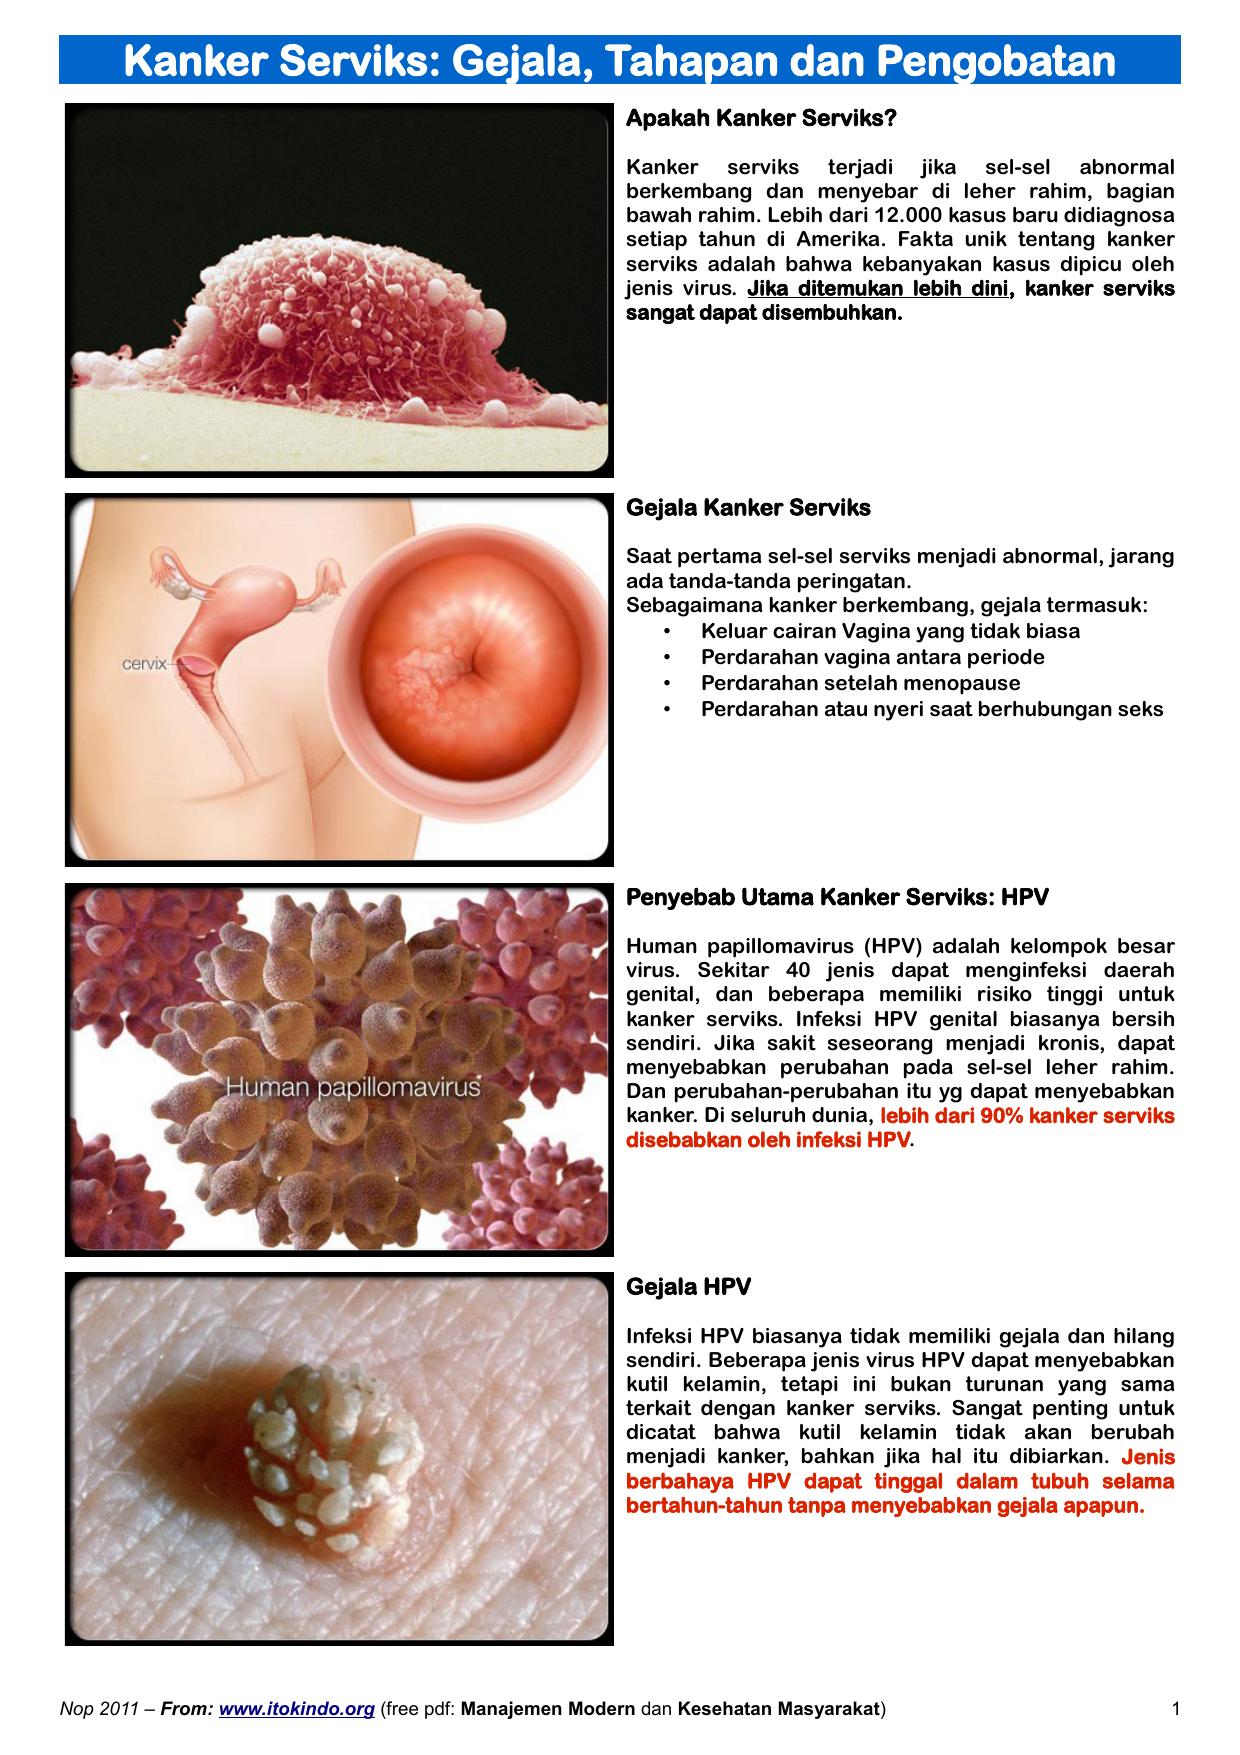 penyebab virus hpv adalah